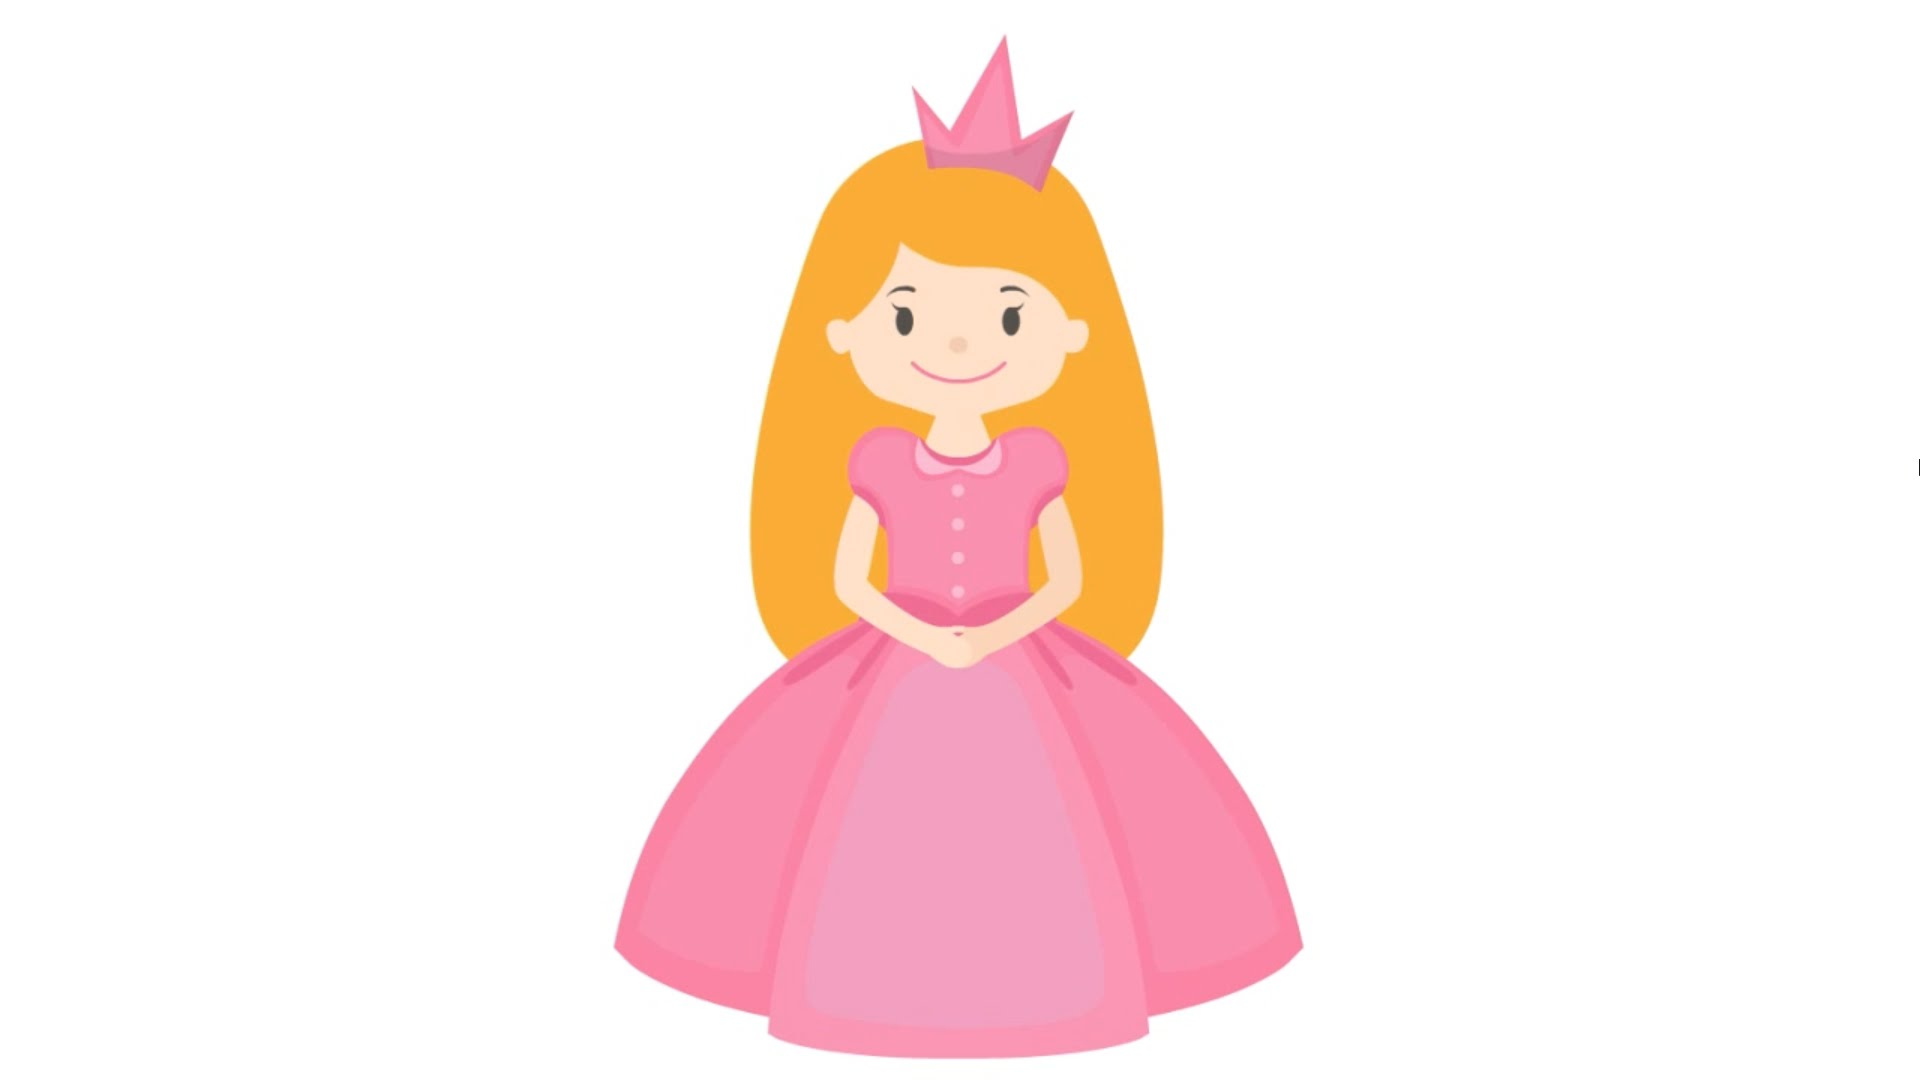 Drawn princess fairytale princess 3 Fairy Cute to Color